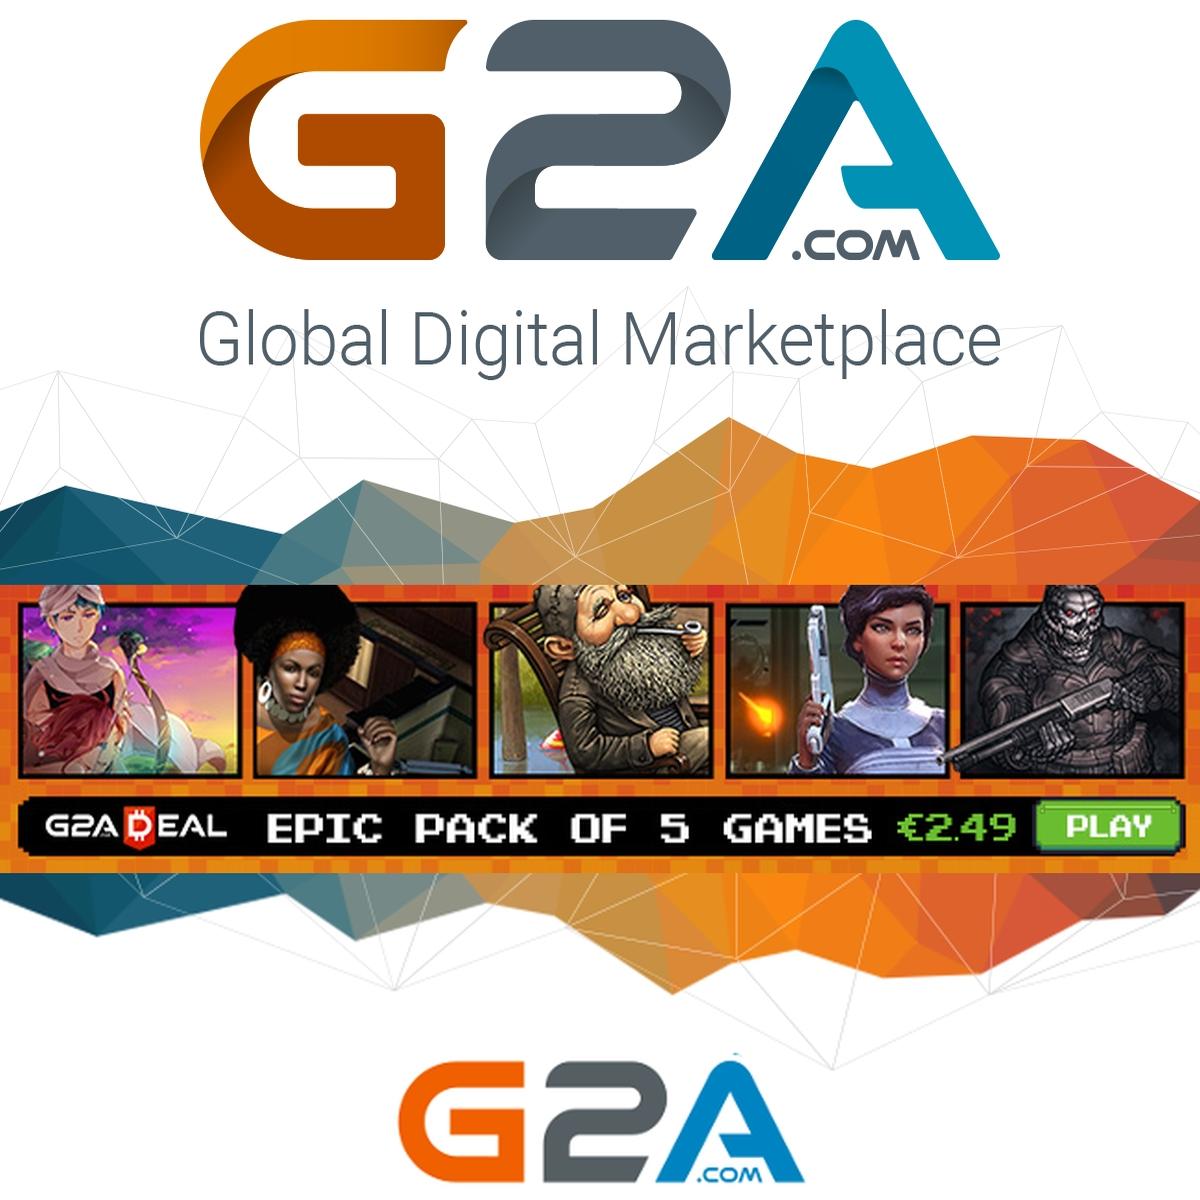 [STEAM] G2A Deal Edition #5 ... ab 18 Juli verfügbar